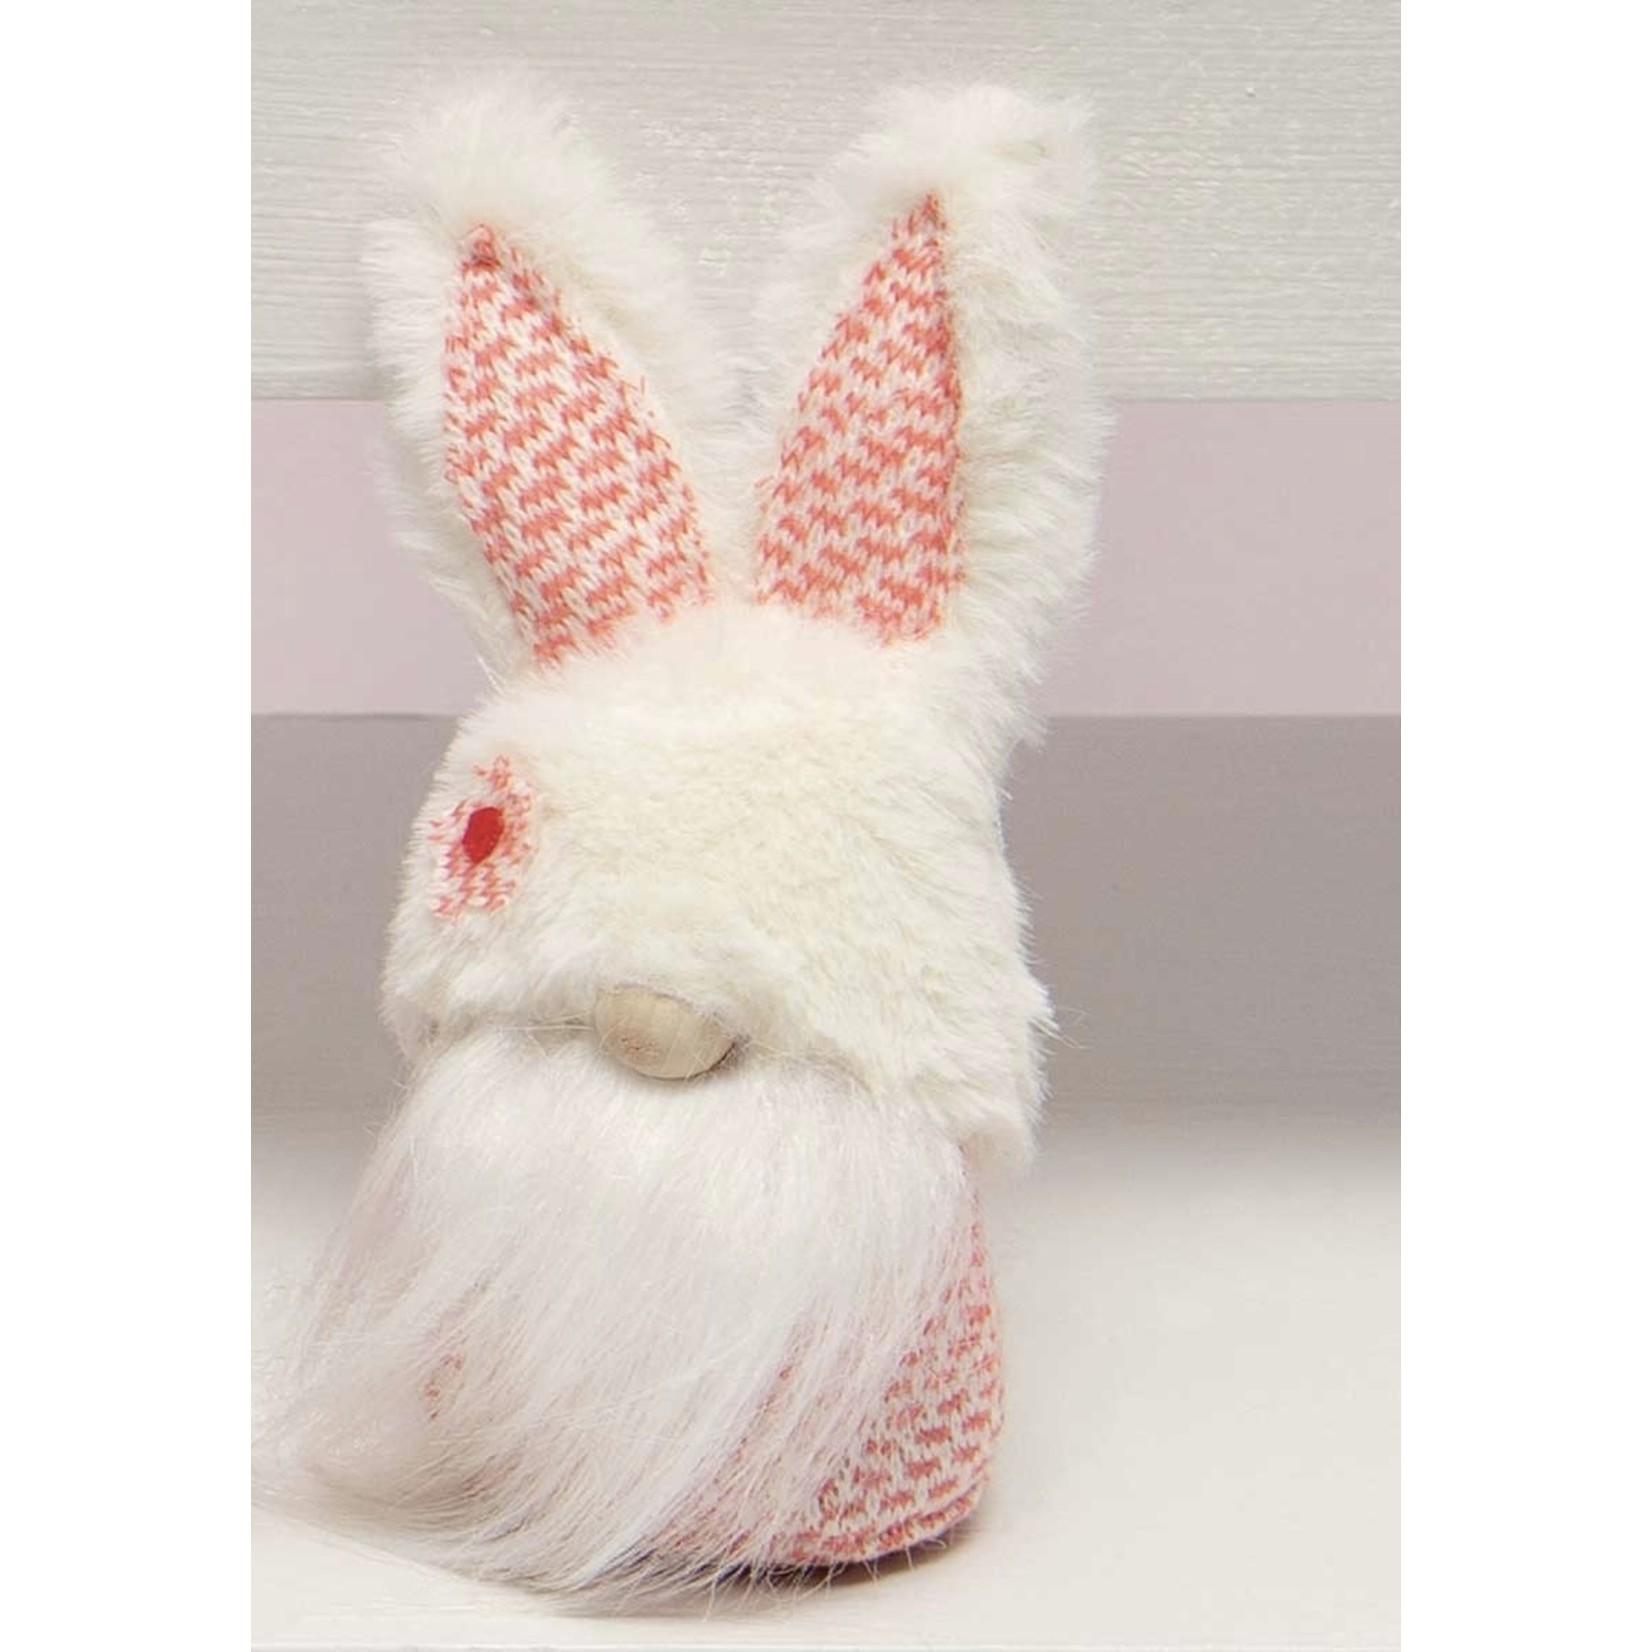 "Mera Vic Seasonal: 8"" Bunny Gnome"